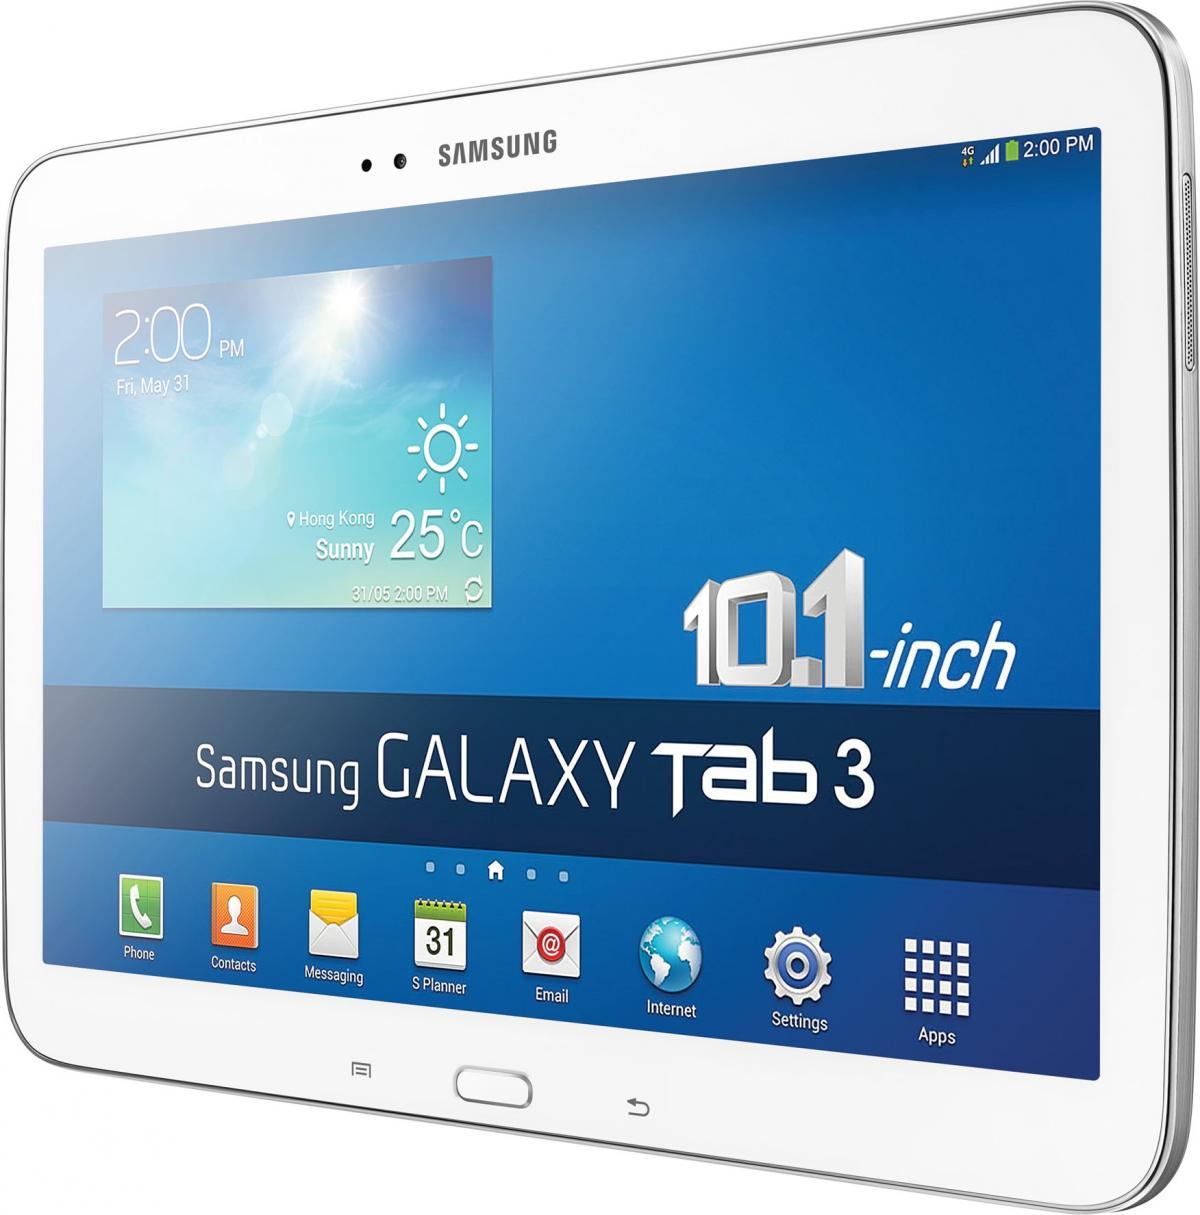 Galaxy Tab 3 10.1 LTE GT-P5220